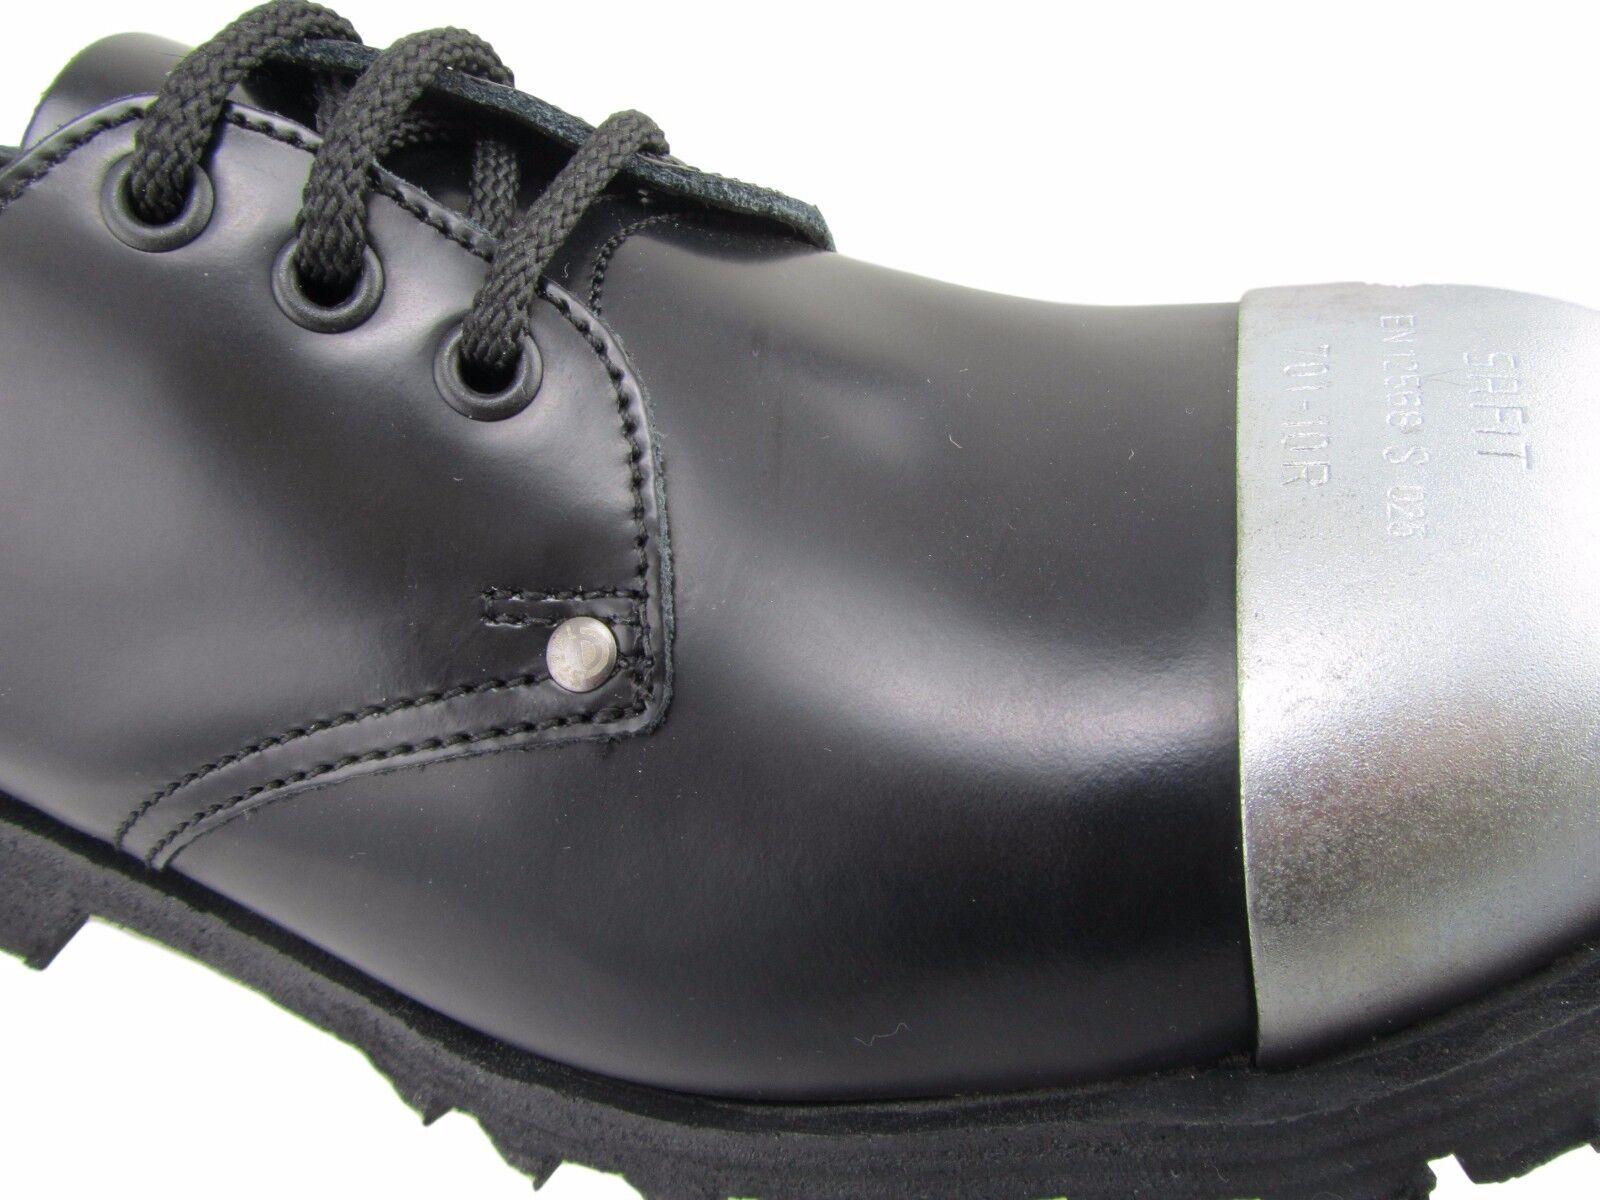 Steel Ground Black Black Black Leather 3 Eyelets Shoes Box Extaernal Safety Cap Shoe 0ebce5